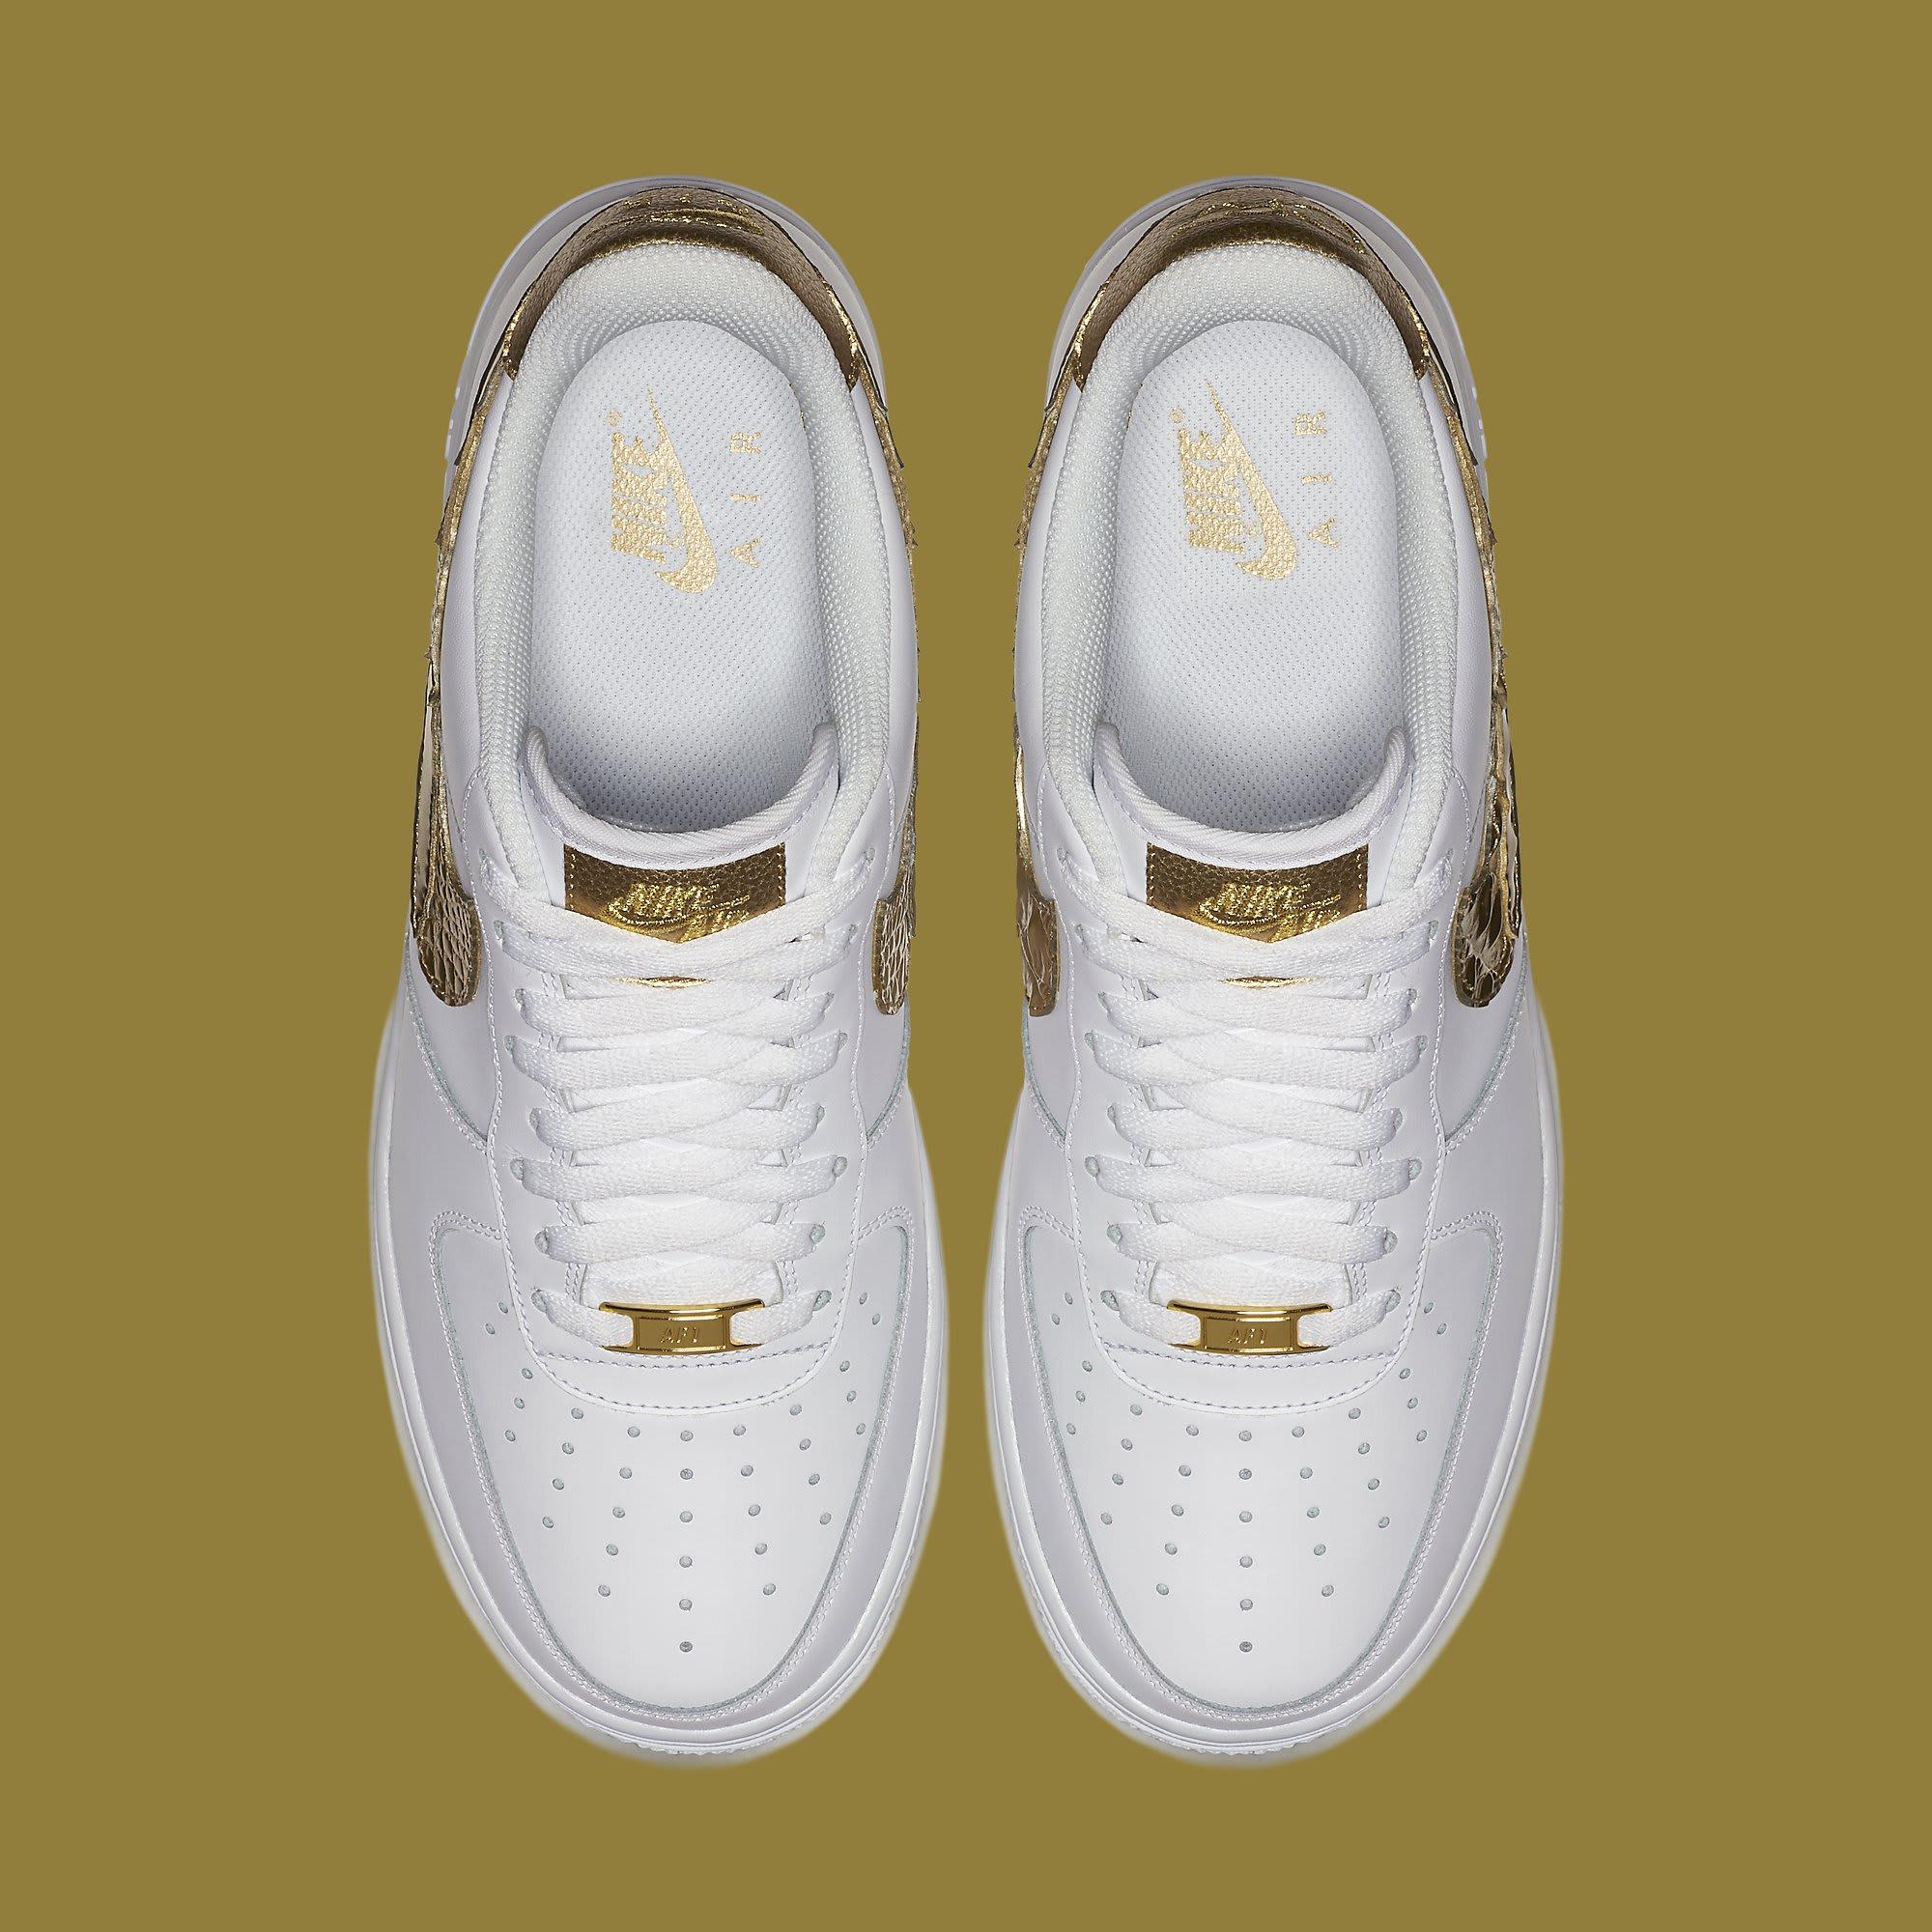 Nike AF1 CR7 Cristiano Ronaldo AQ0666-100